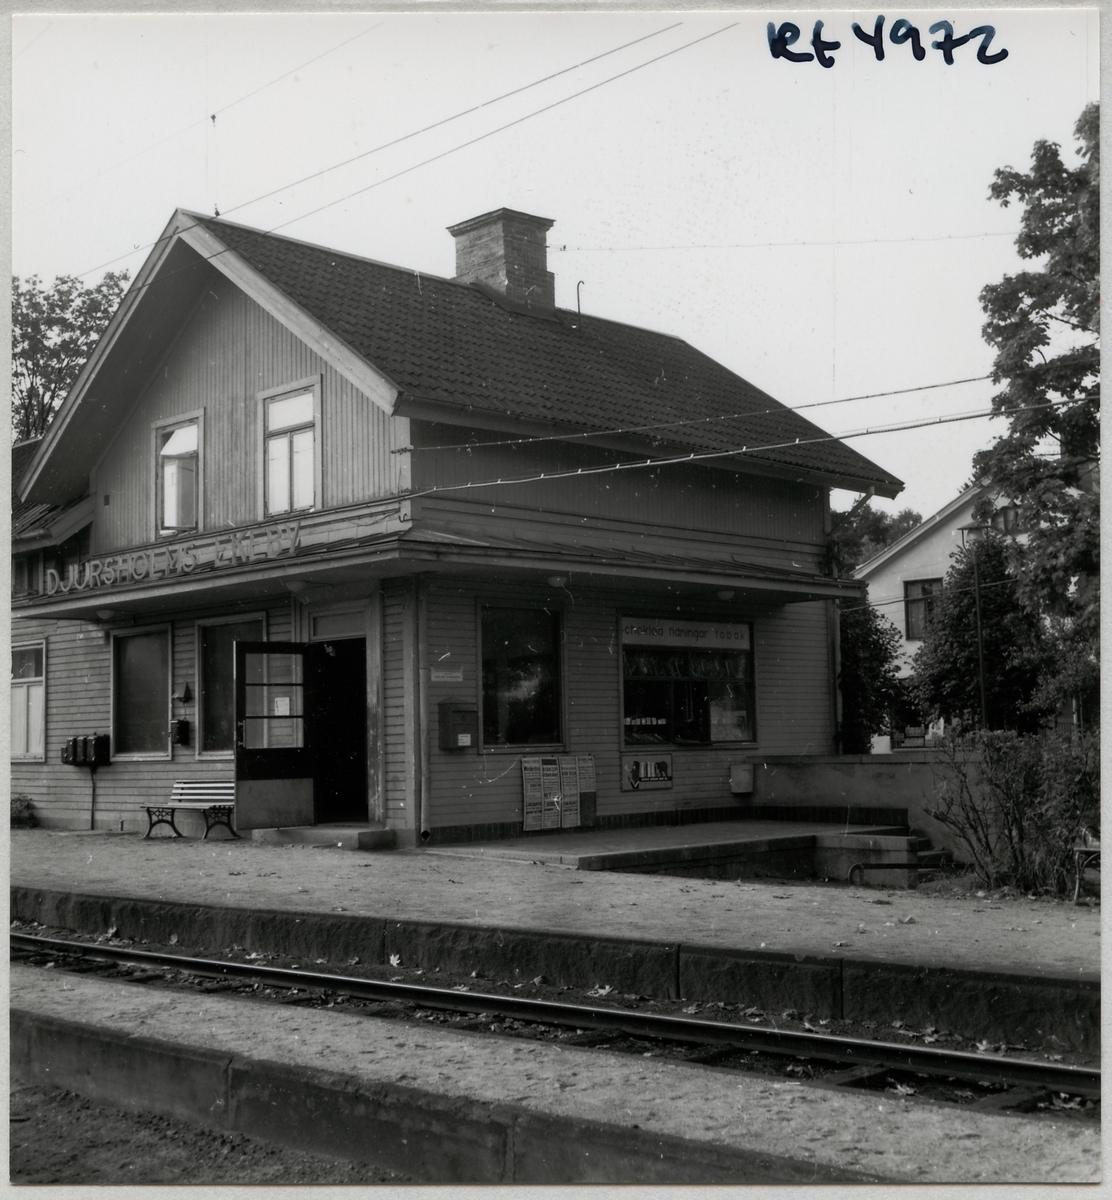 Djursholms Ekeby station.